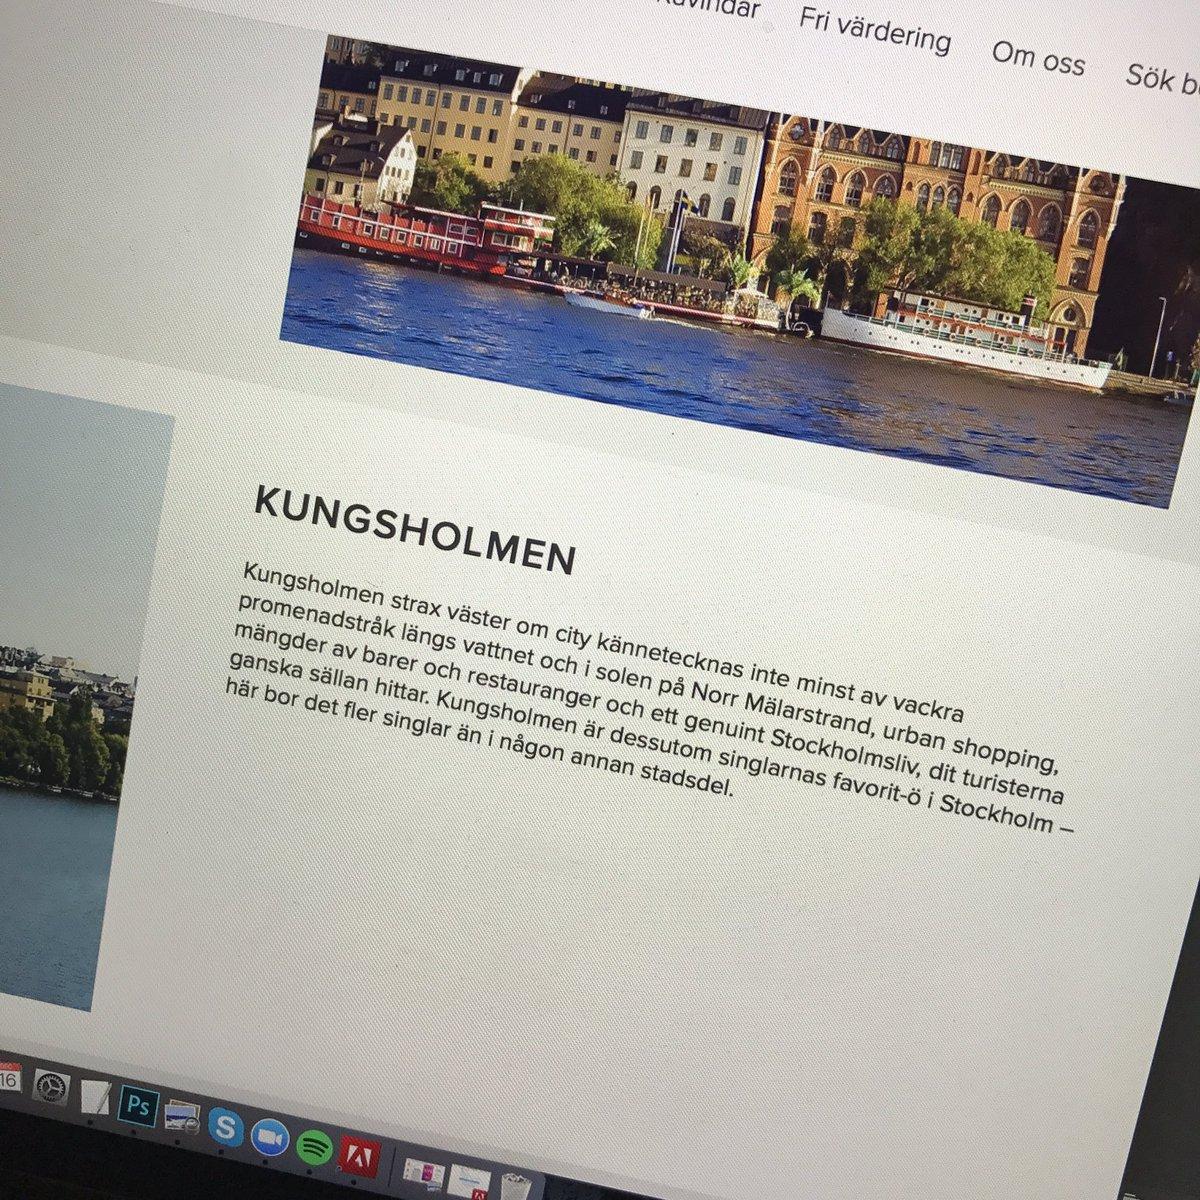 Krleksakut fr eviga singlar ppnar i stan - StockholmDirekt